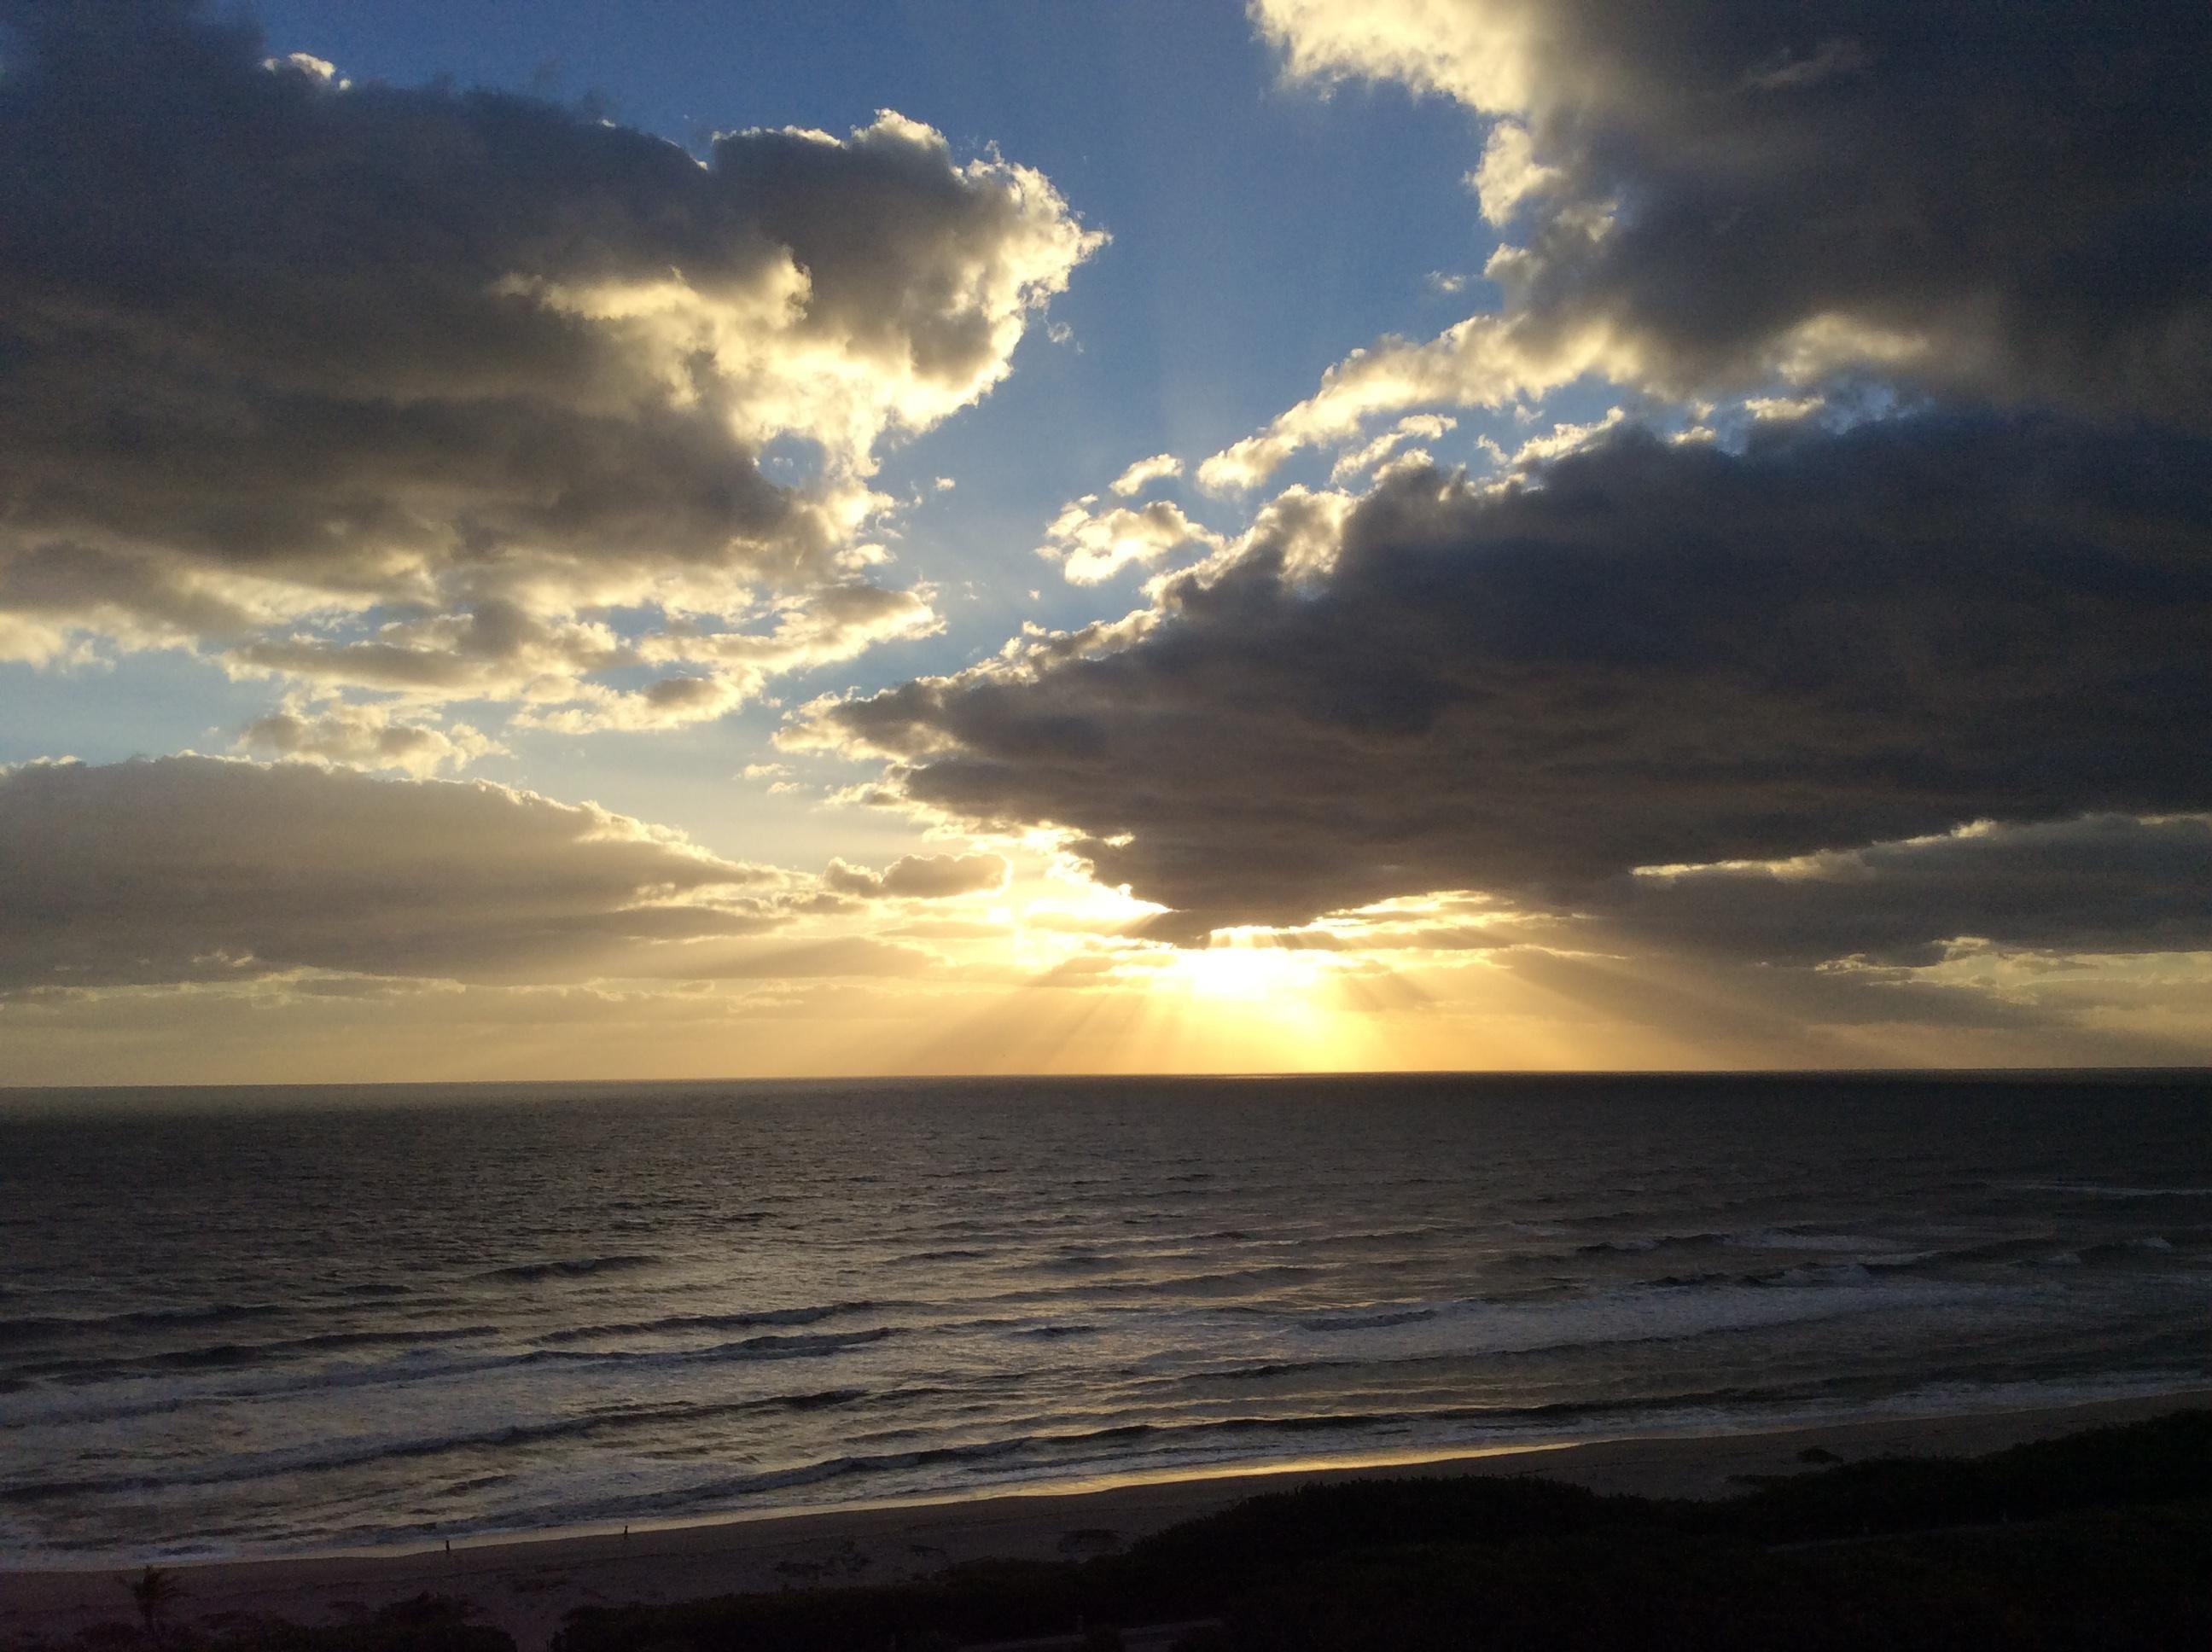 700 Ocean Royale Unit Ph 4 Juno Beach, FL 33408